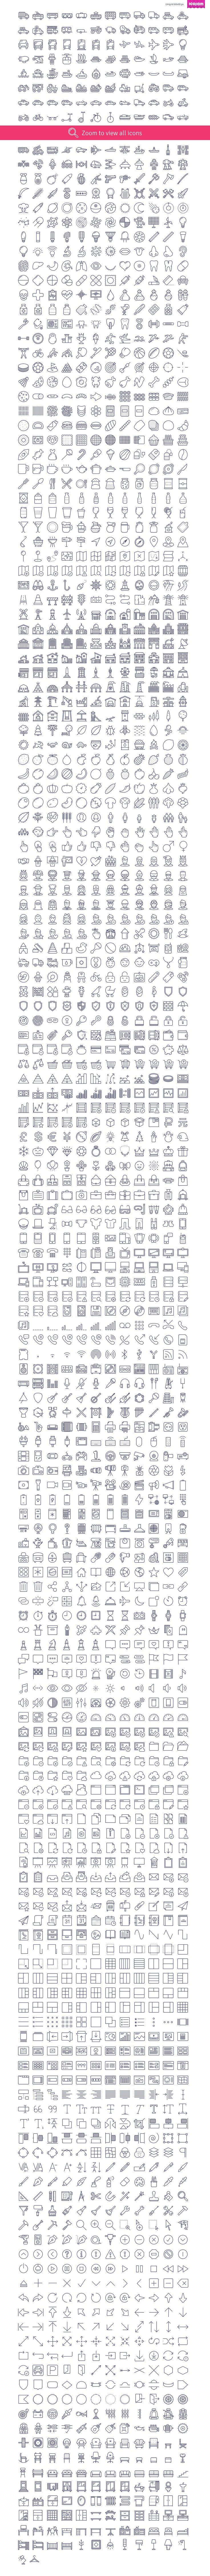 2090 icons in UniGrid set #design Download: https://creativemarket.com/Icojam/107723-2090-icons-in-UniGrid-set?u=ksioks